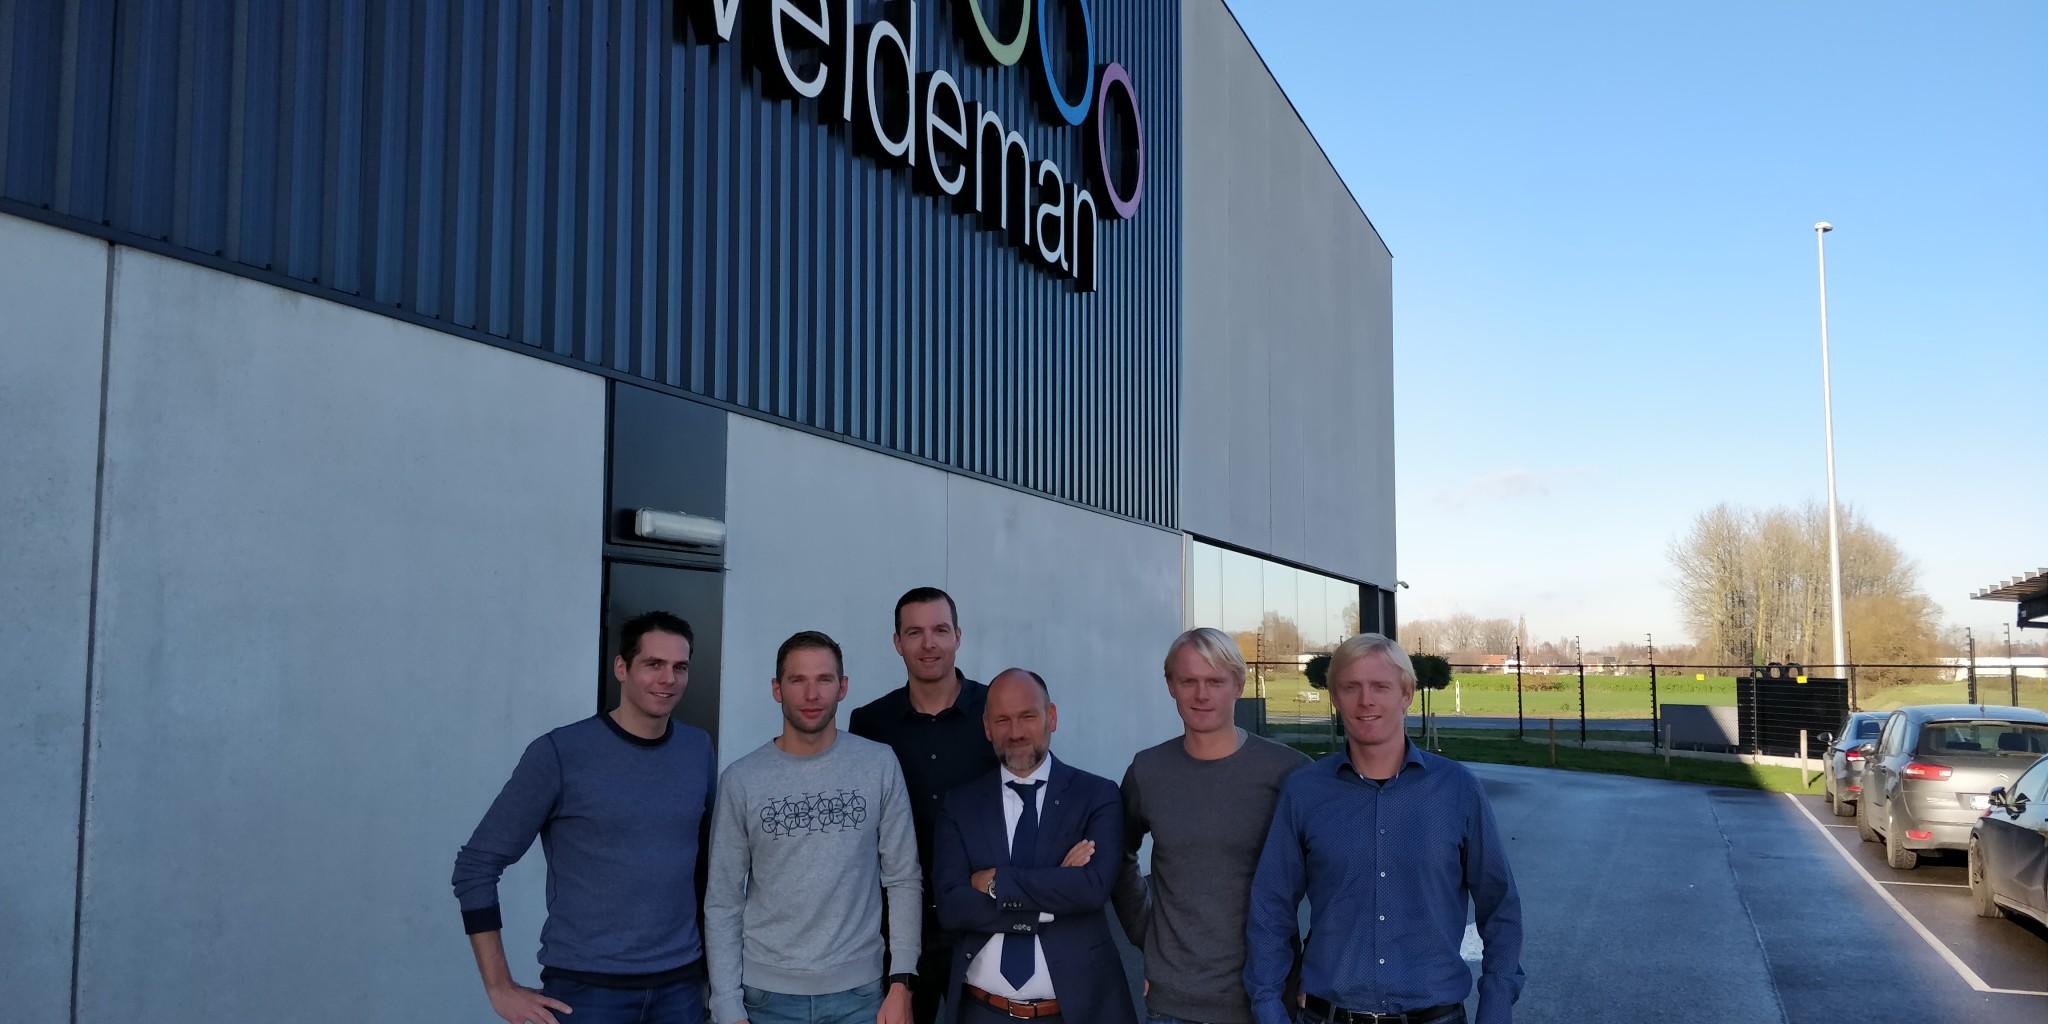 Toon, Bart, Gert, Michaël, Stefaan en Stijn (foto: 3athlon.be)